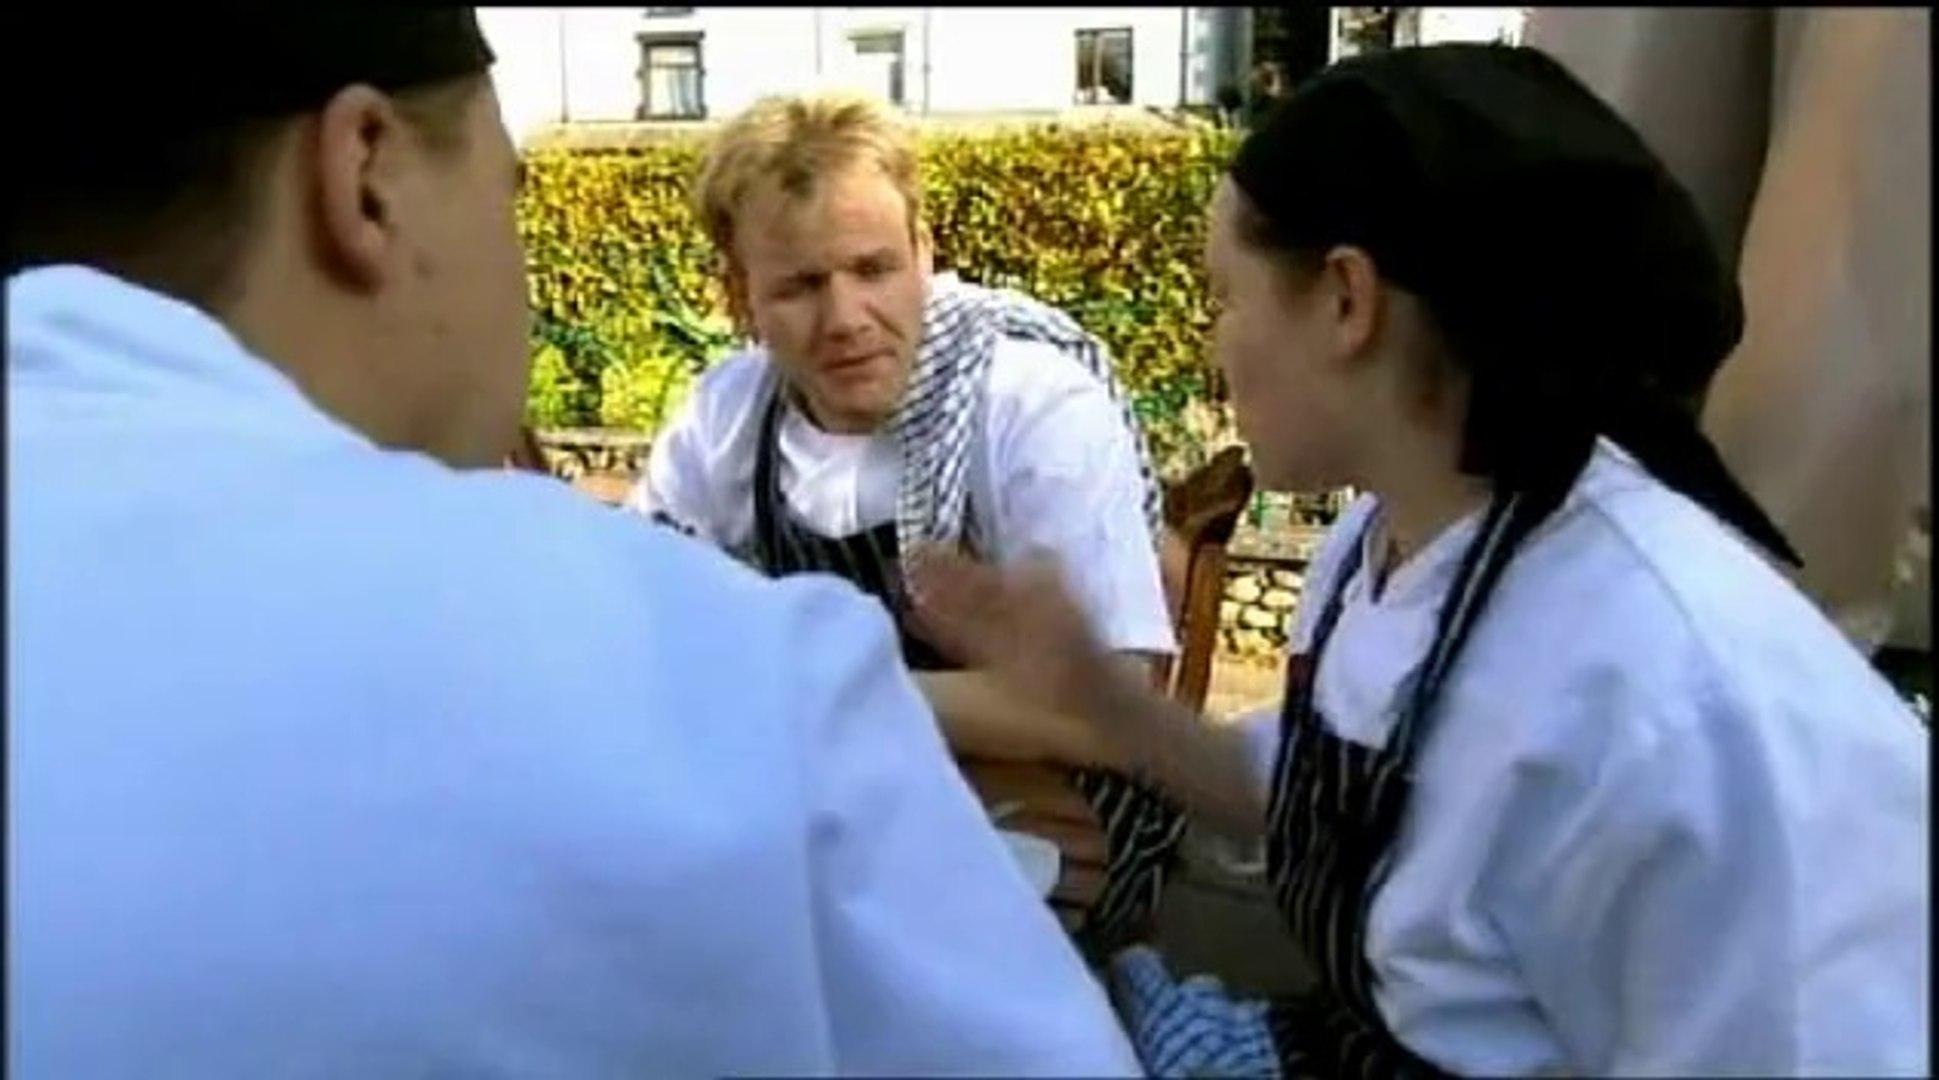 Kitchen Nightmares Uk Season 1 Episode 2 The Glass House Video Dailymotion